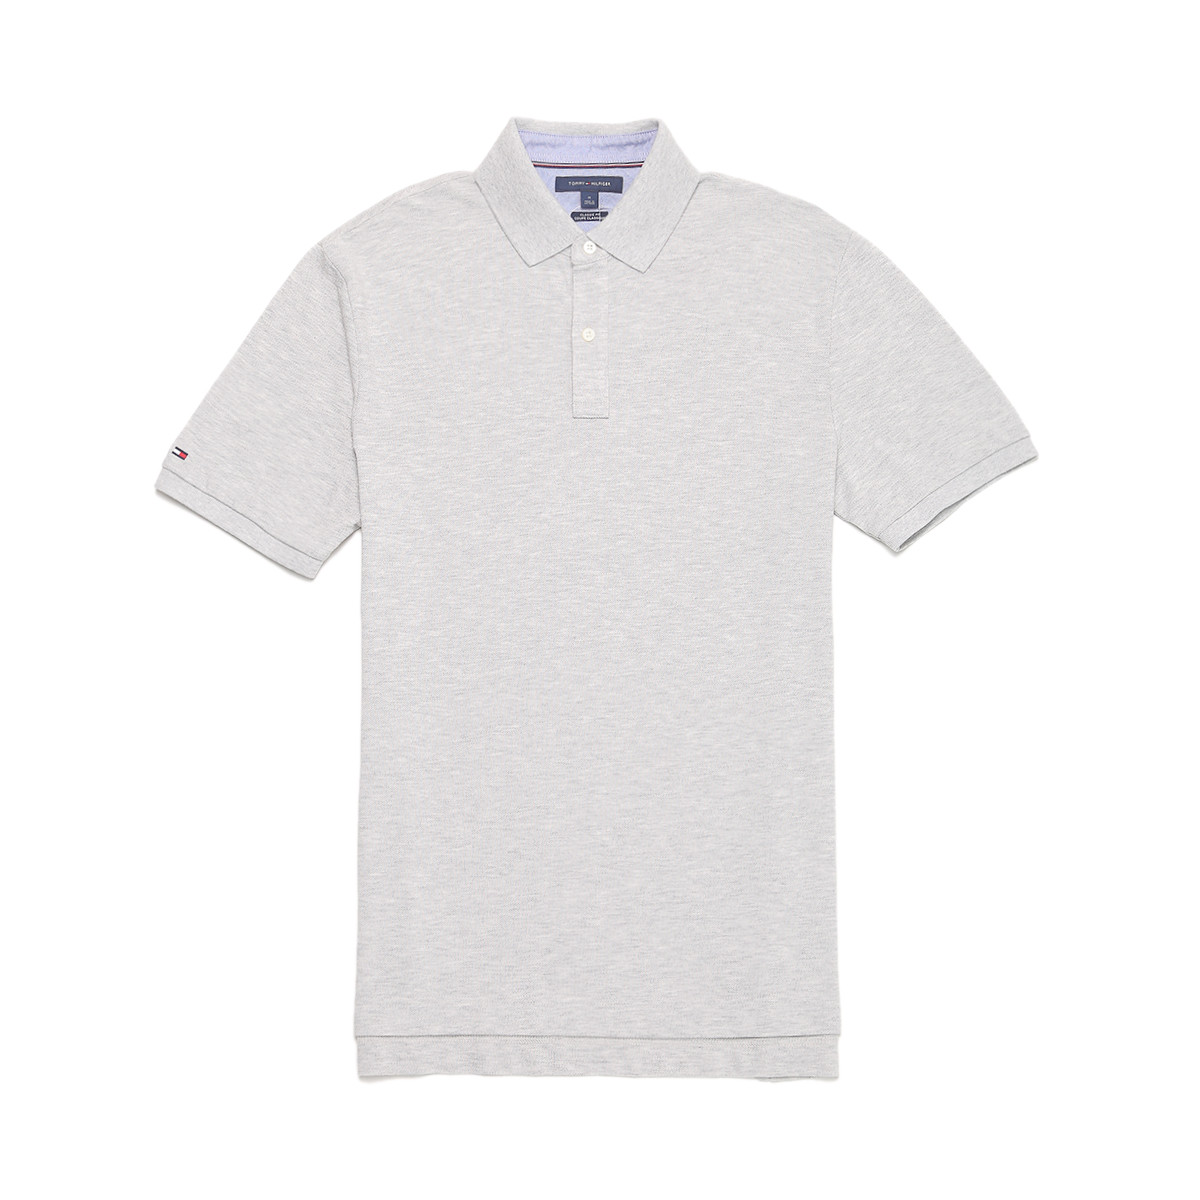 TOMMY HILFIGER商务休闲短袖夏季男式Polo衫